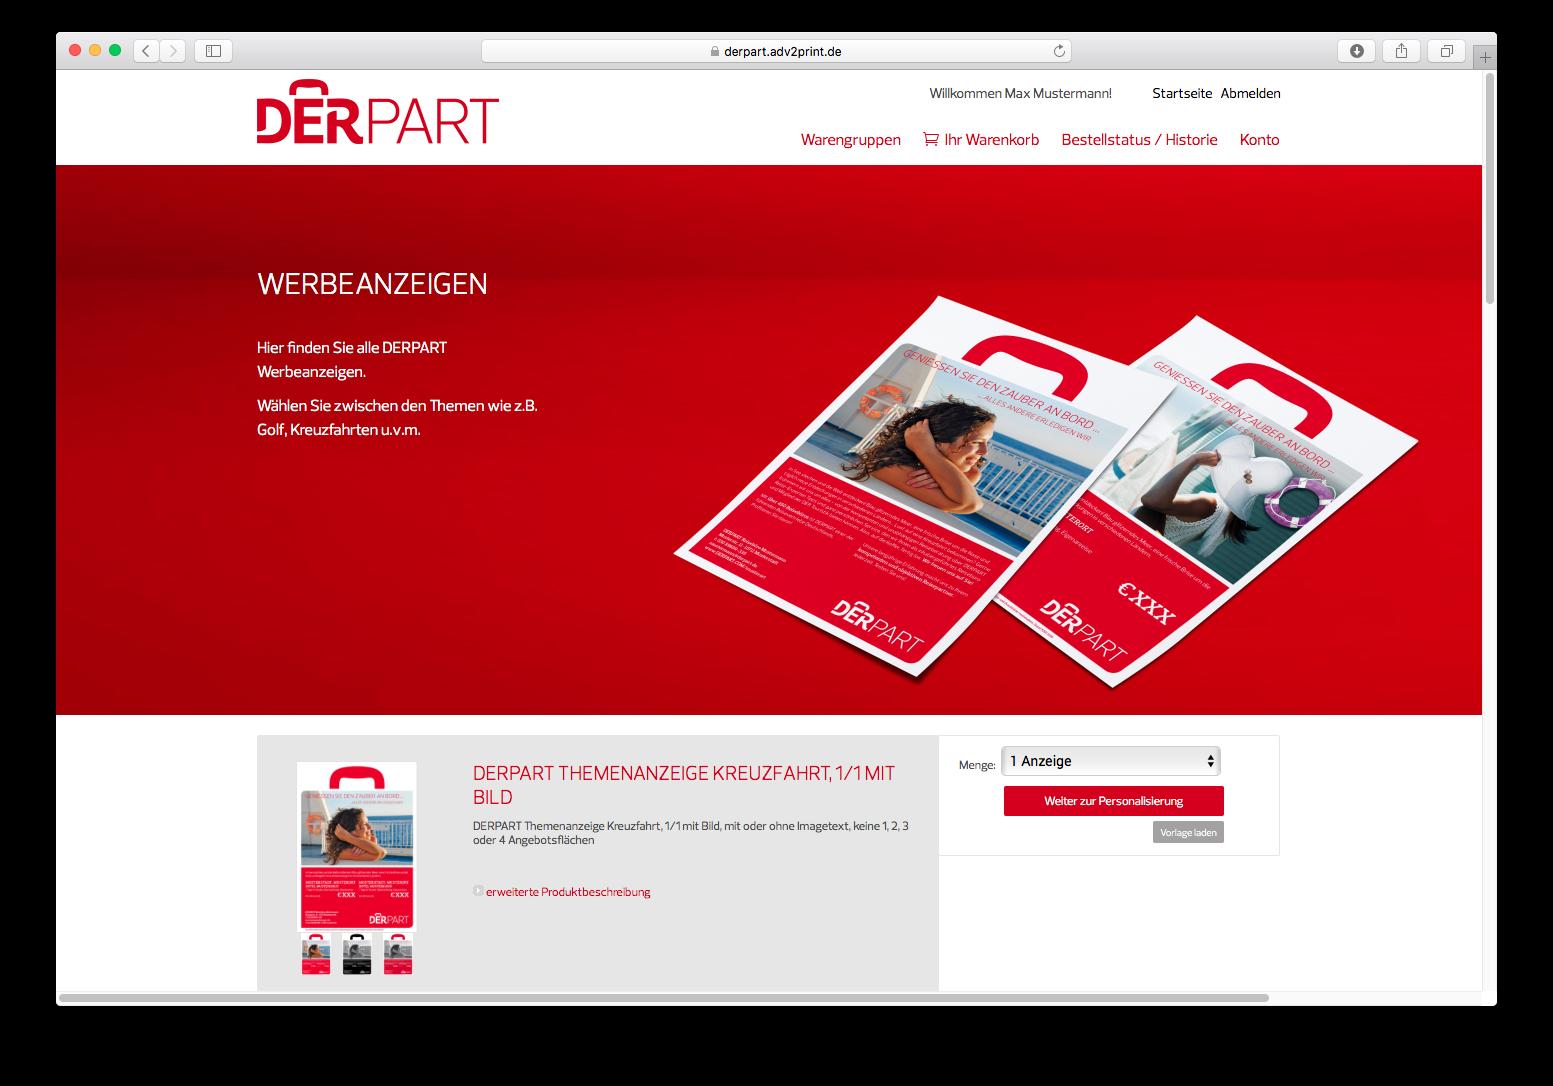 bk_derpart_web2print_3